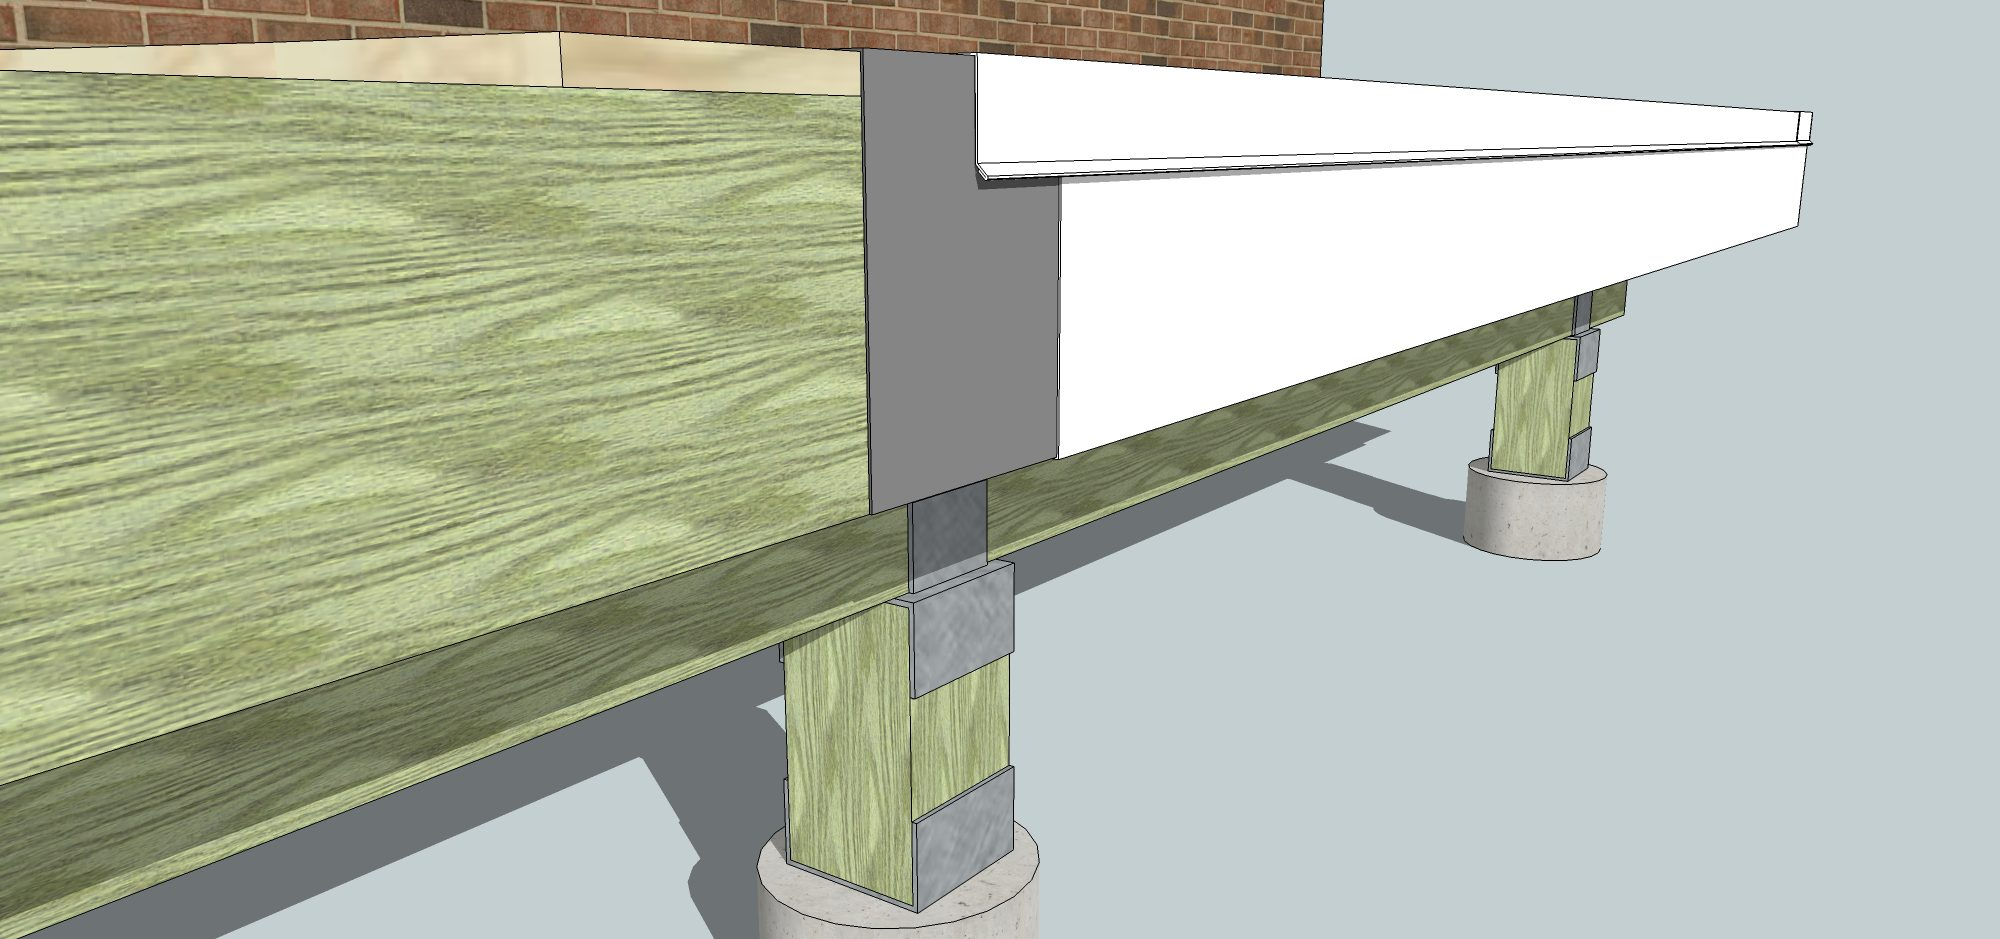 Sunroom Deck Flashing-4